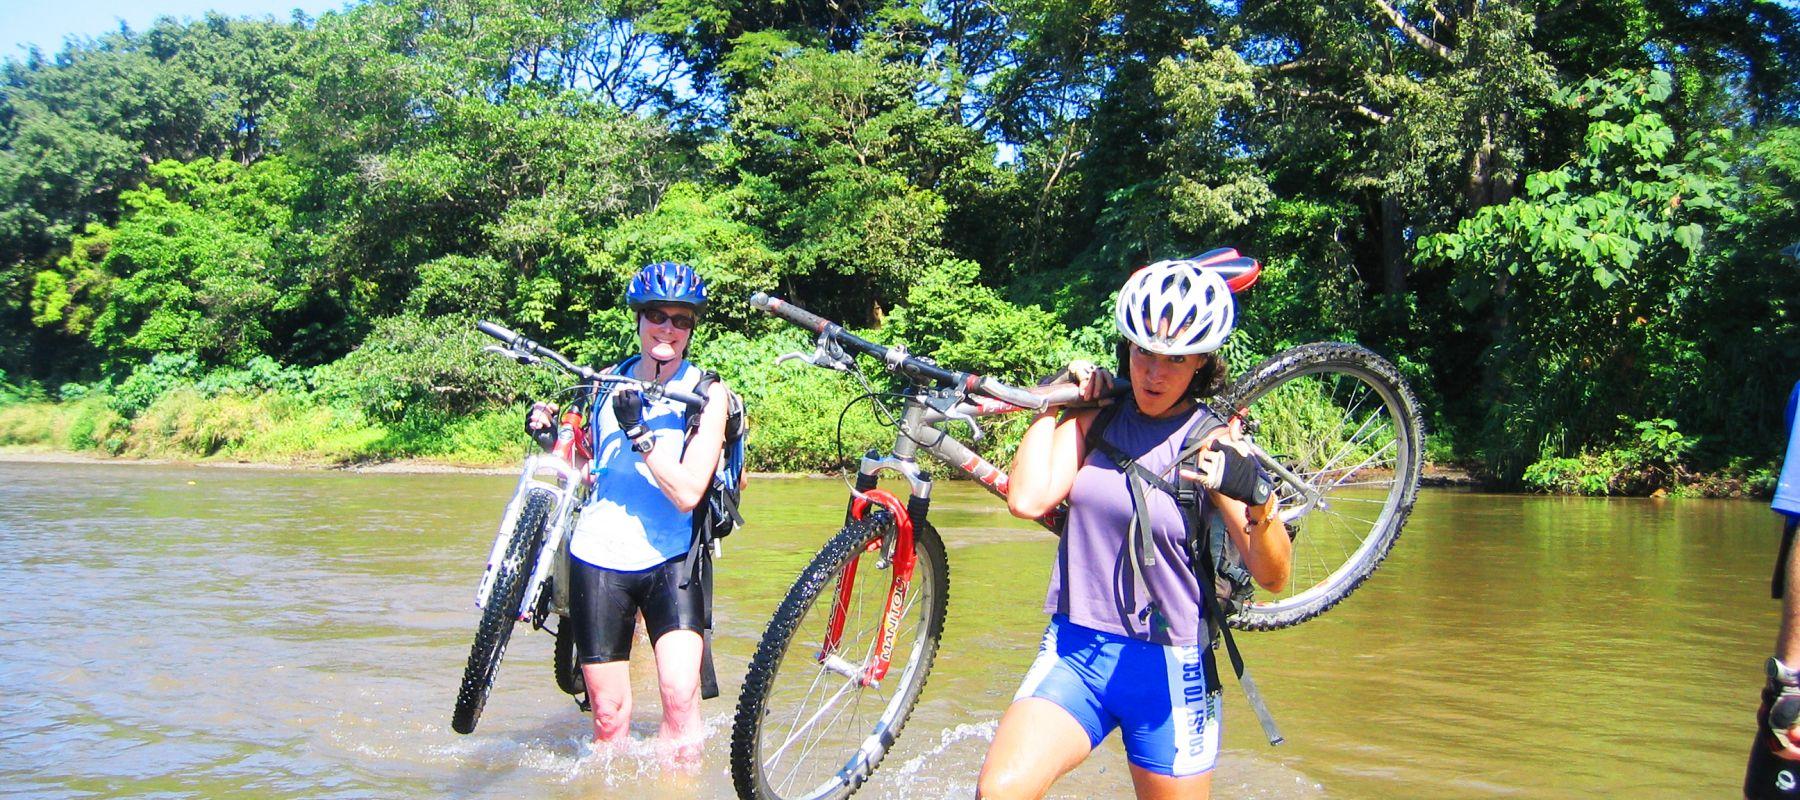 Costa Rica Coast to Coast Bike Tour, Bicycle Tour, Cycling